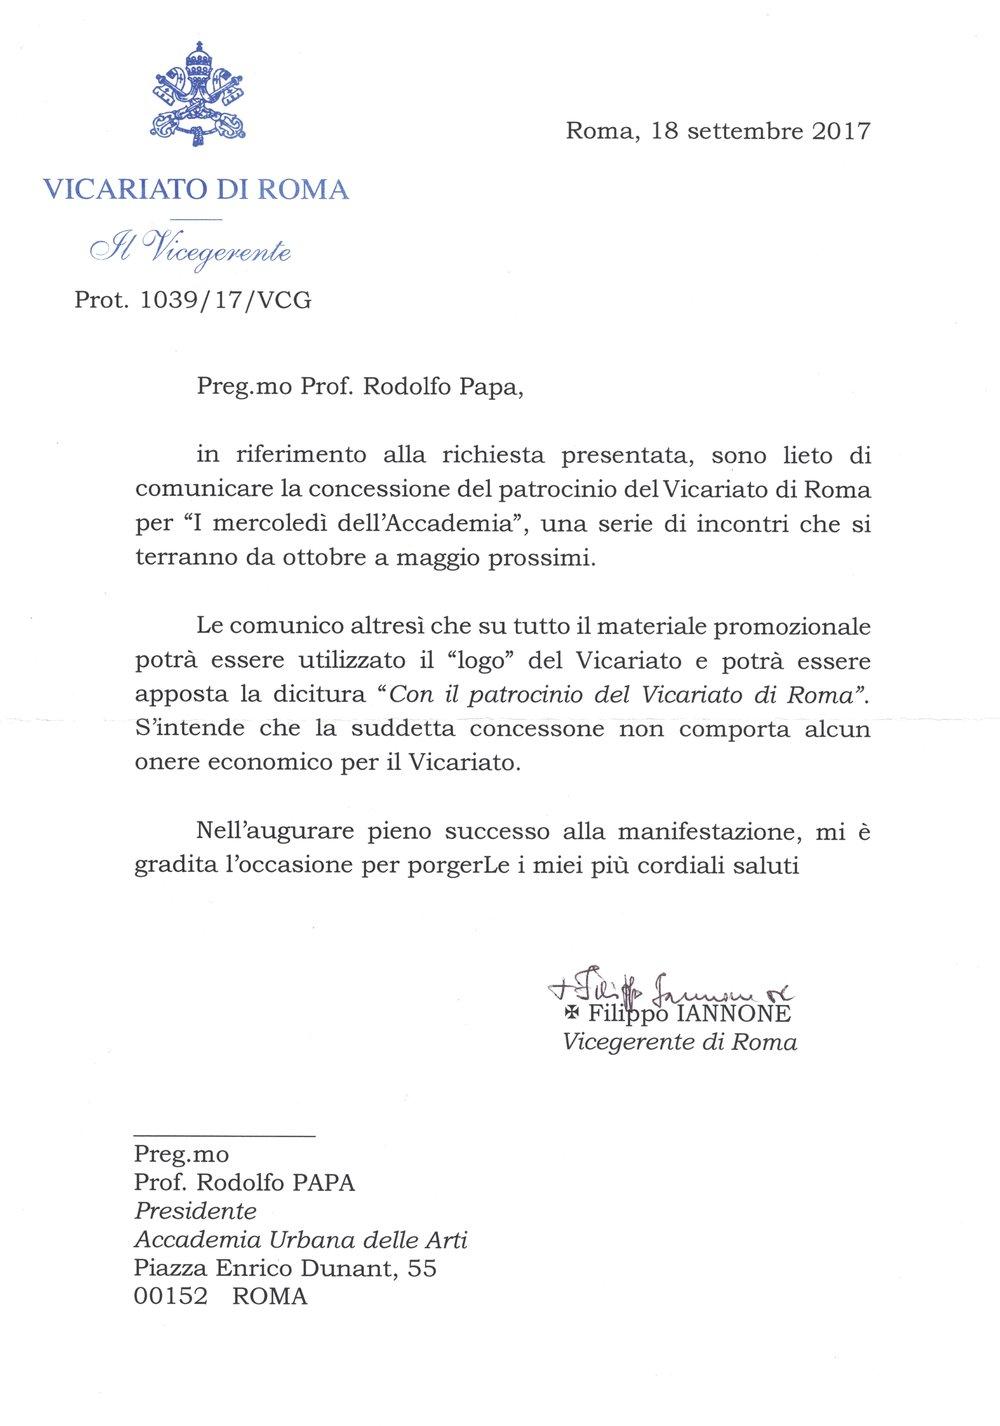 VICARIATO ROMA12102017.jpg